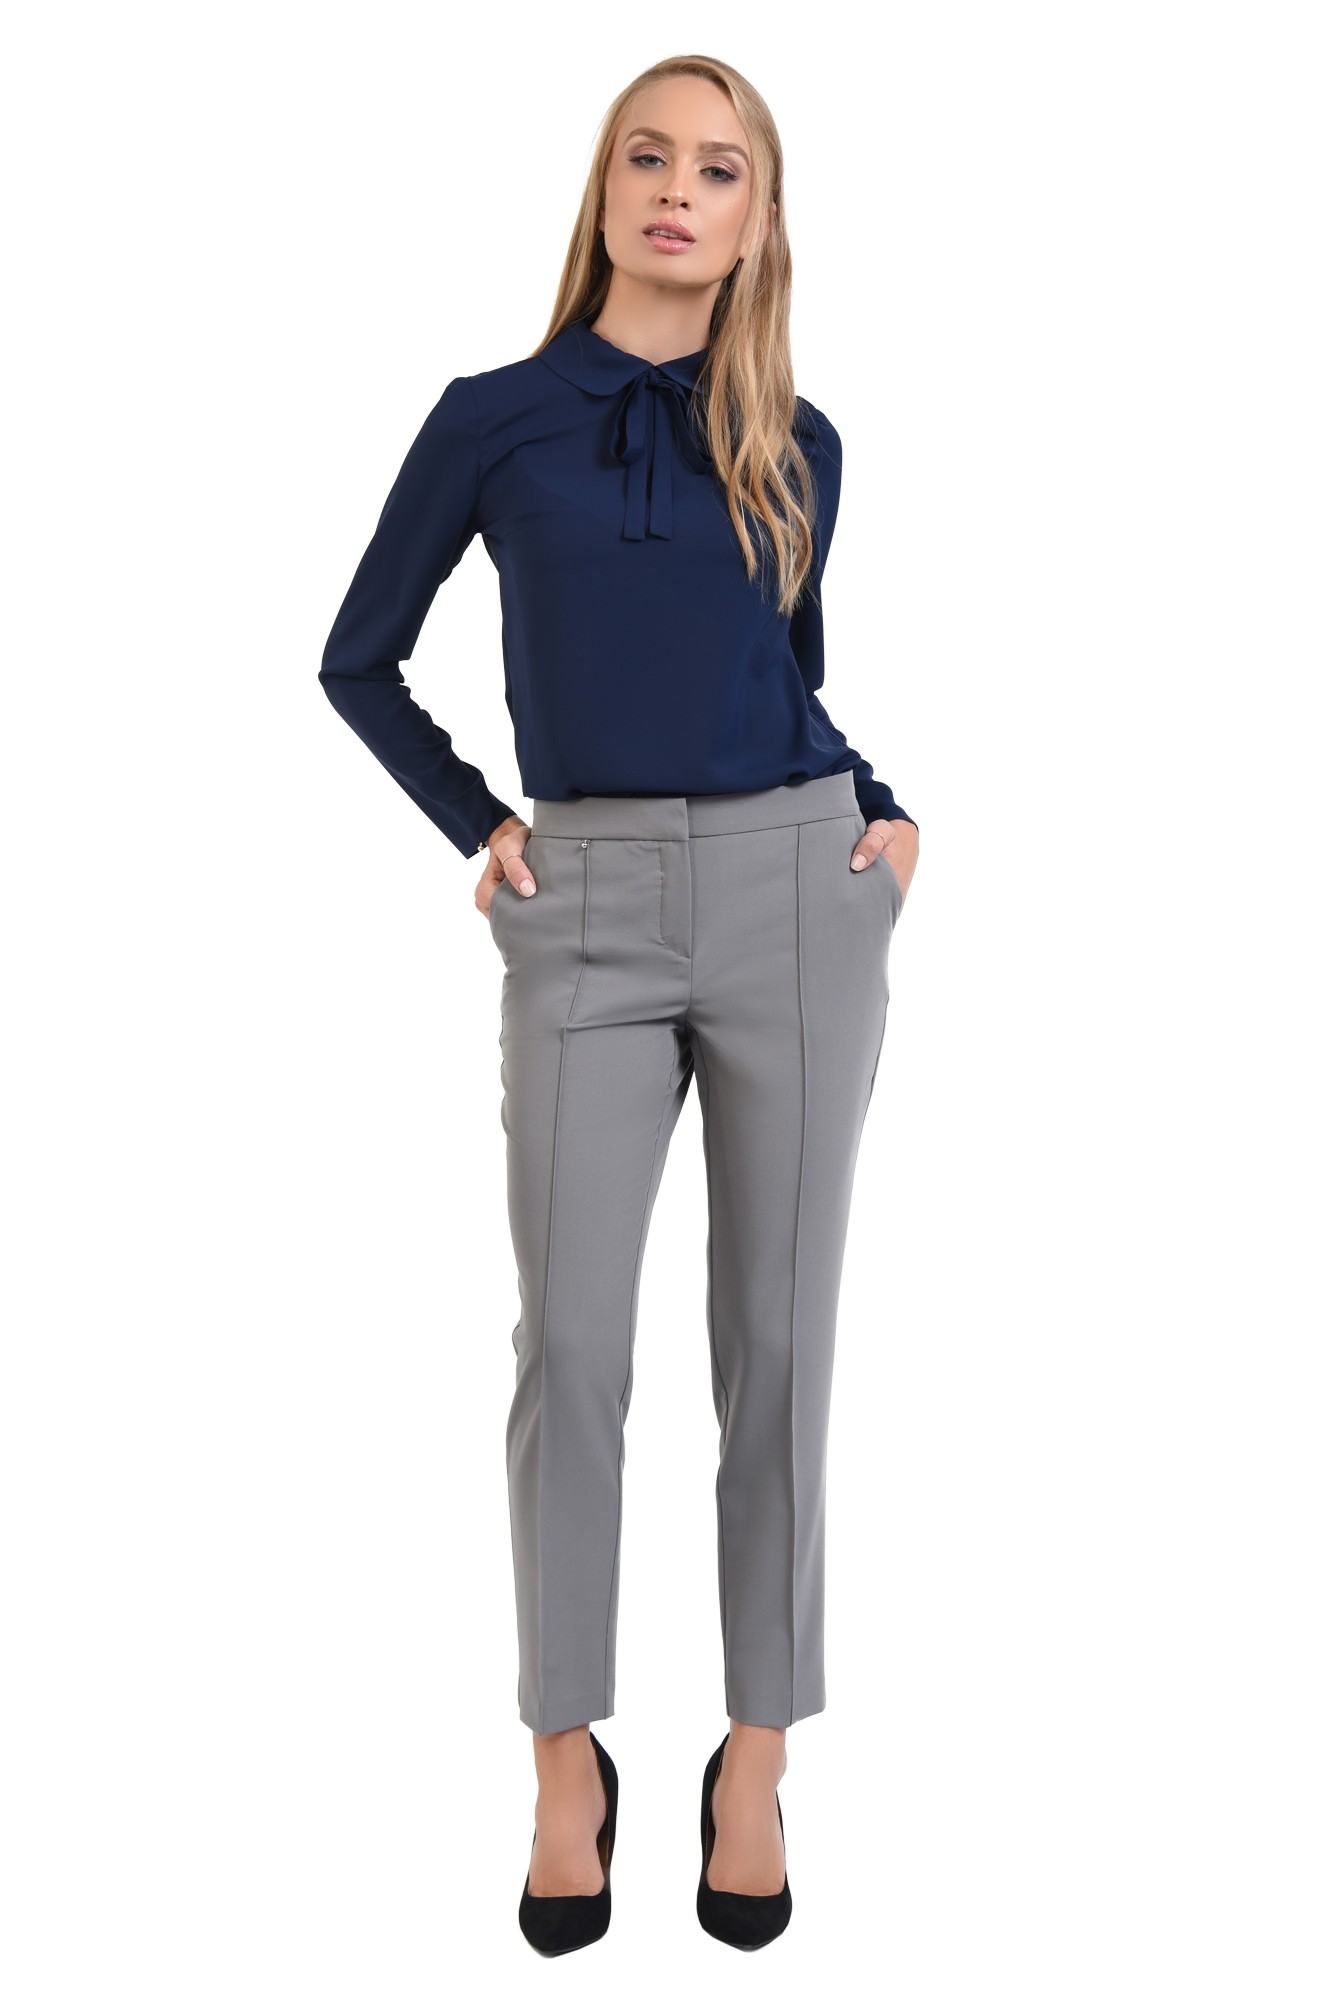 360 - bluza office, cu funda, guler rotunjit, bluza de birou, bleumarin